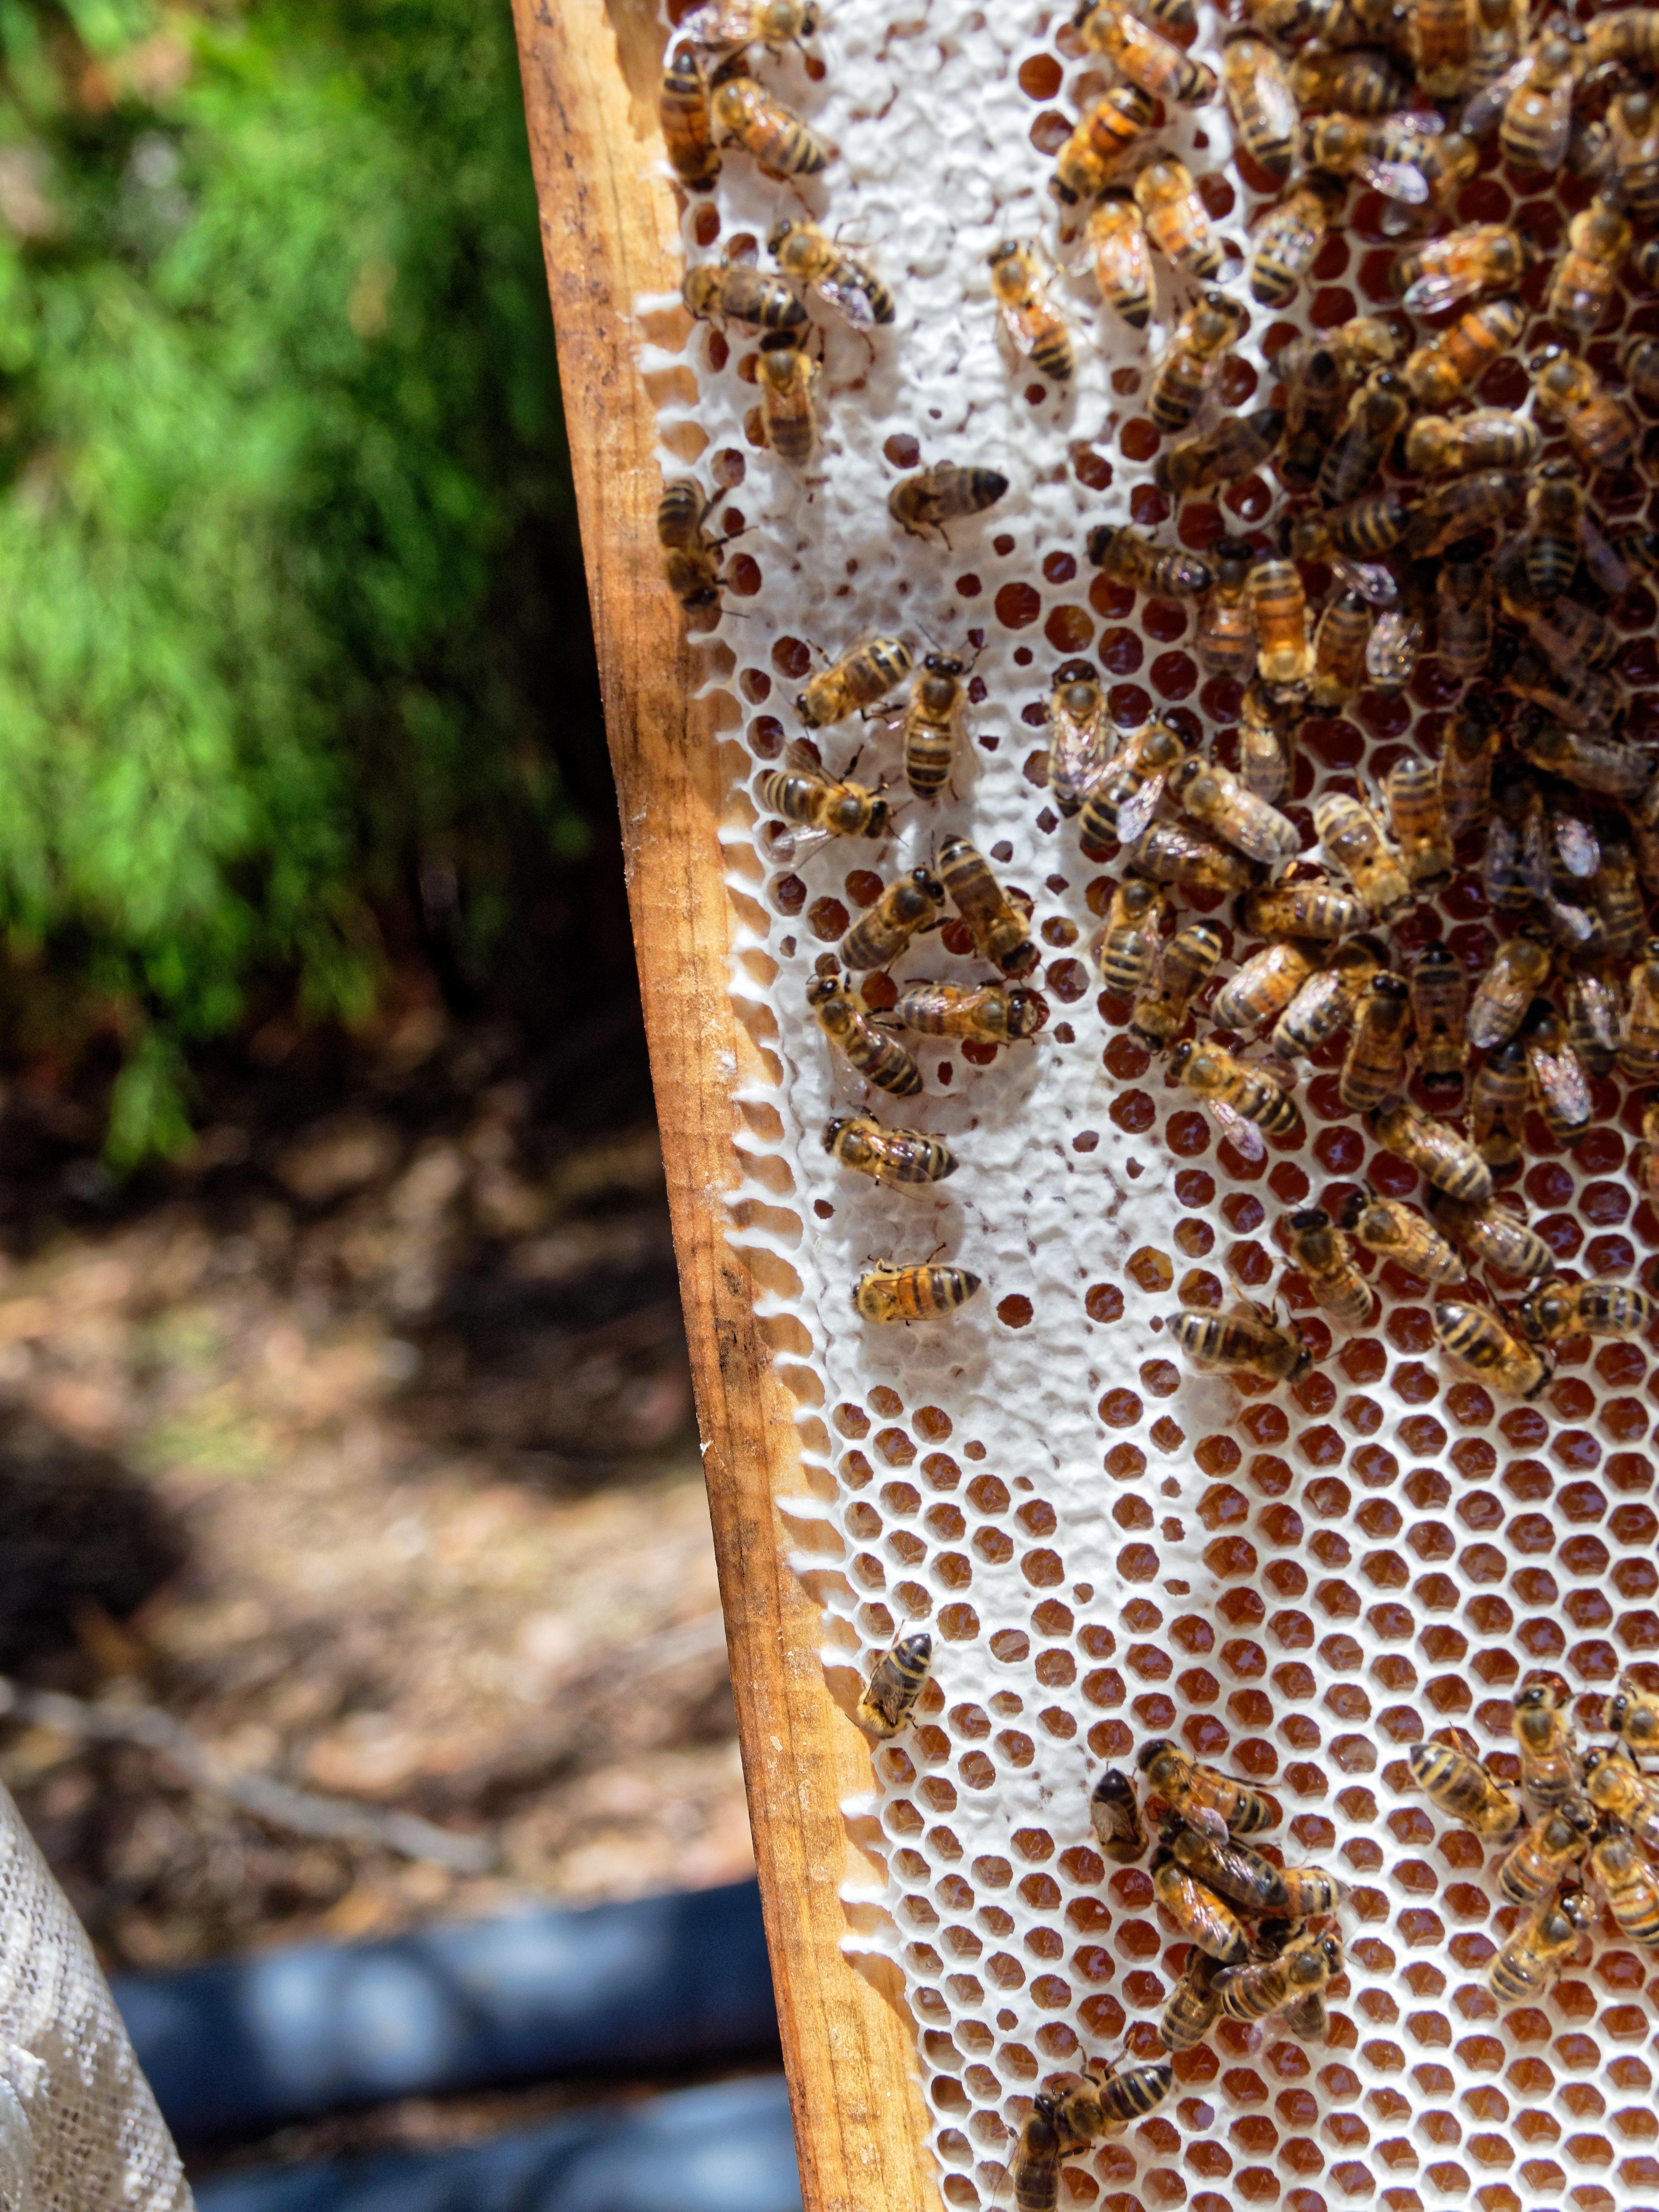 Inspecting-beehives-31.jpeg